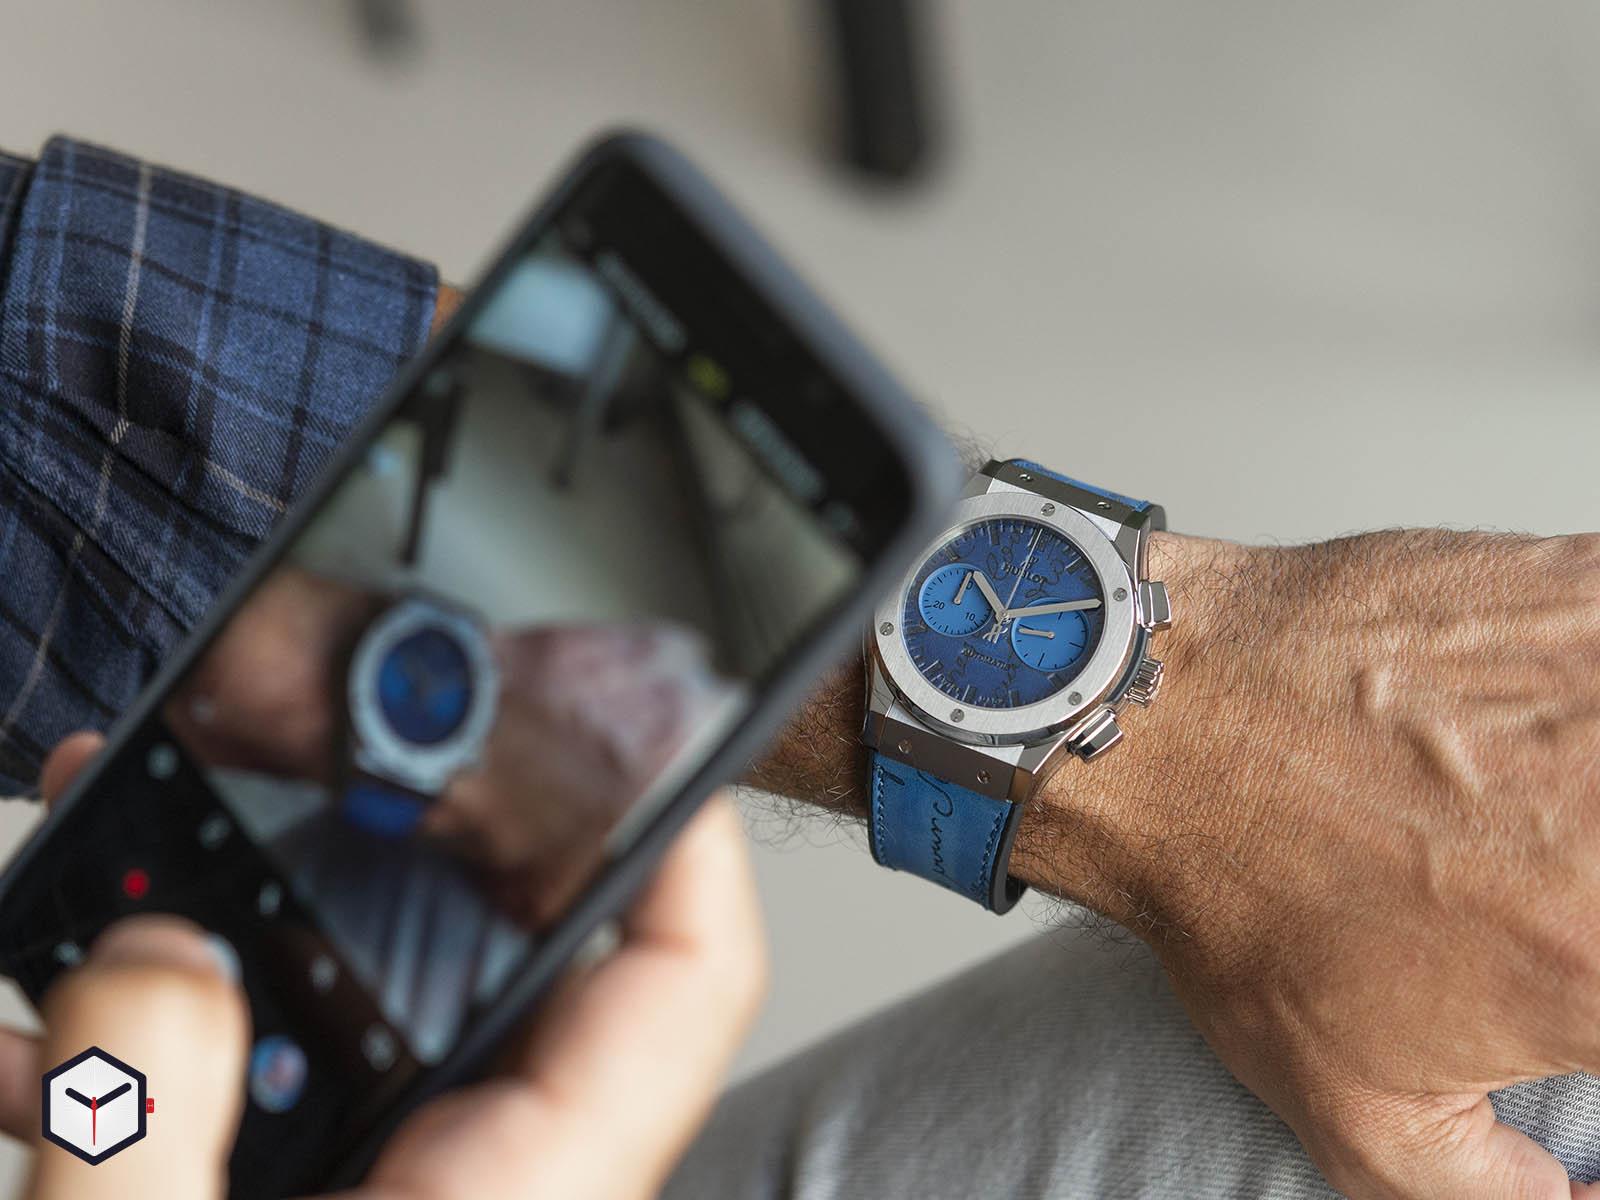 521-nx-050b-vr-ber18-hublot-classic-fusion-chronograph-berluti-scritto-ocean-blue-45mm-11.jpg